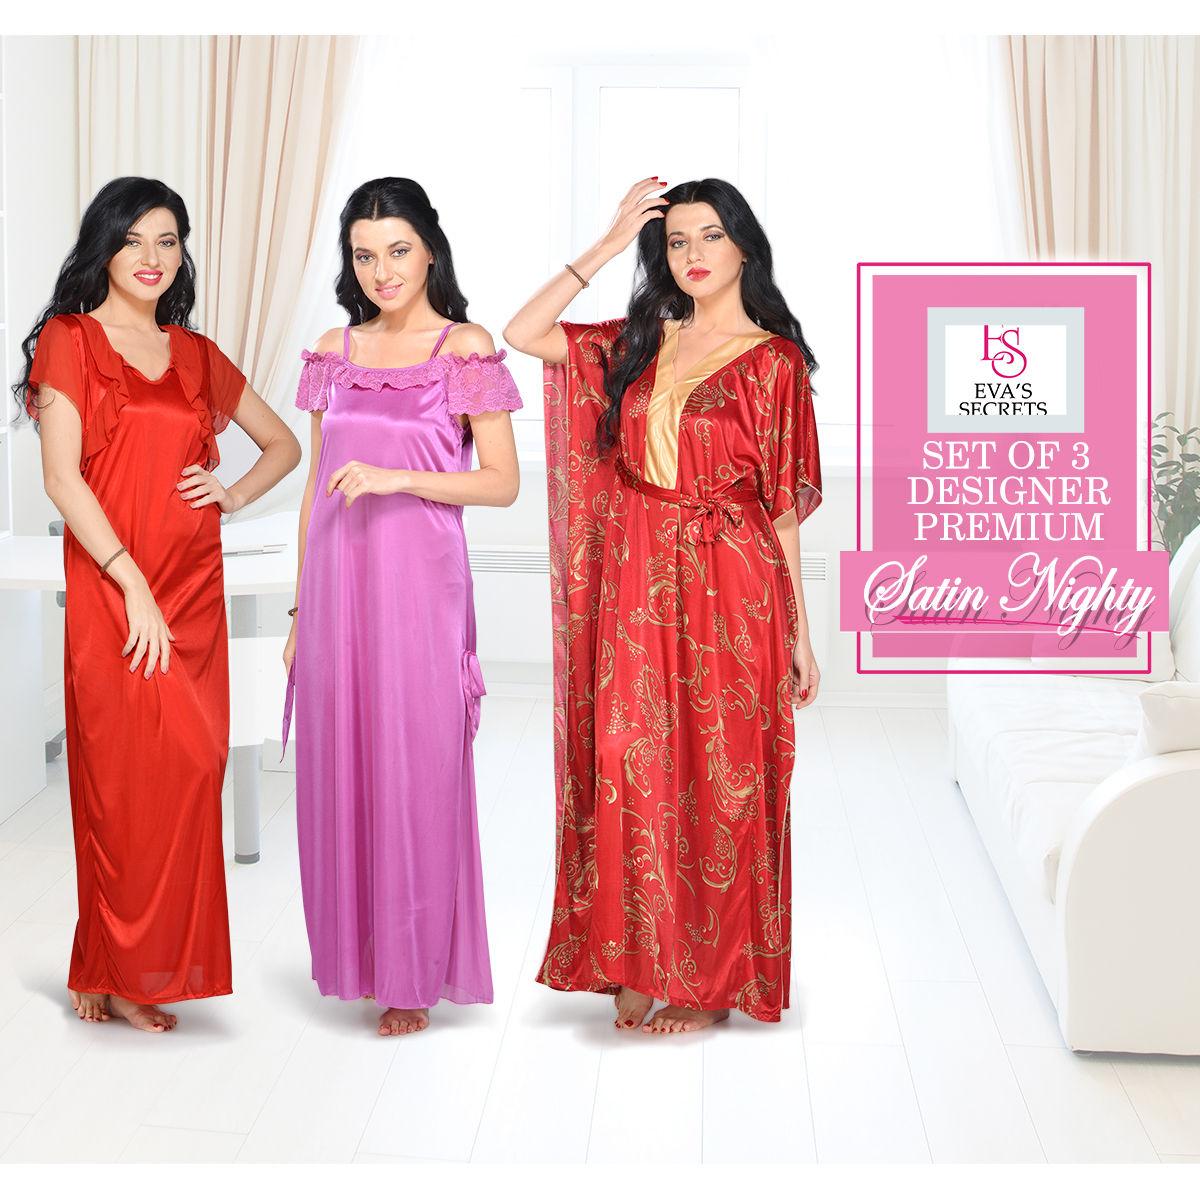 7dedcf7f4 Buy Eva s Secrets Set of 3 Designer Premium Satin Nighty Online at Best  Price in India on Naaptol.com